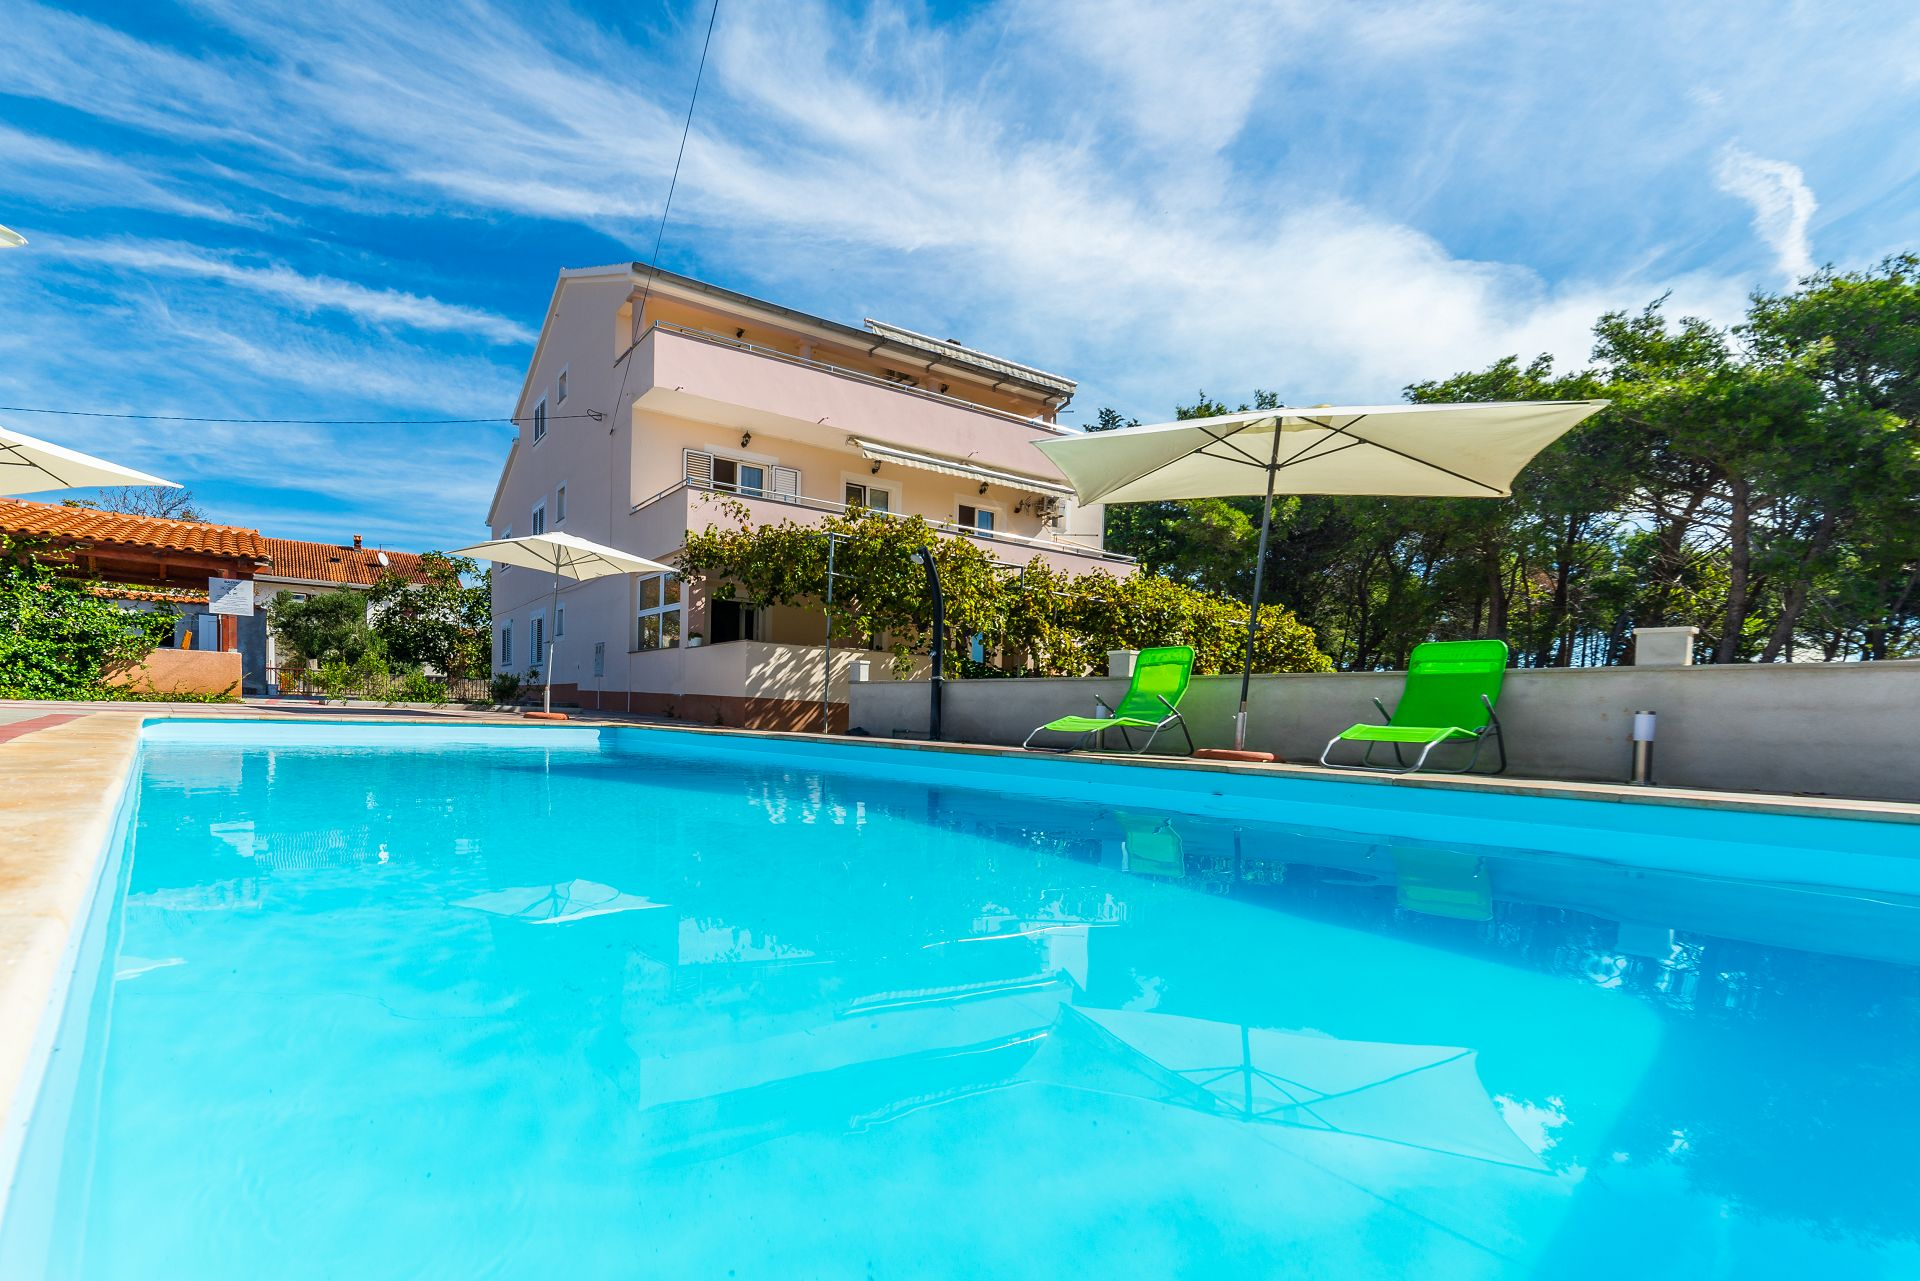 Mla?o - swimming pool: A3(2+2) - Privlaka Ferienwohnung in Kroatien